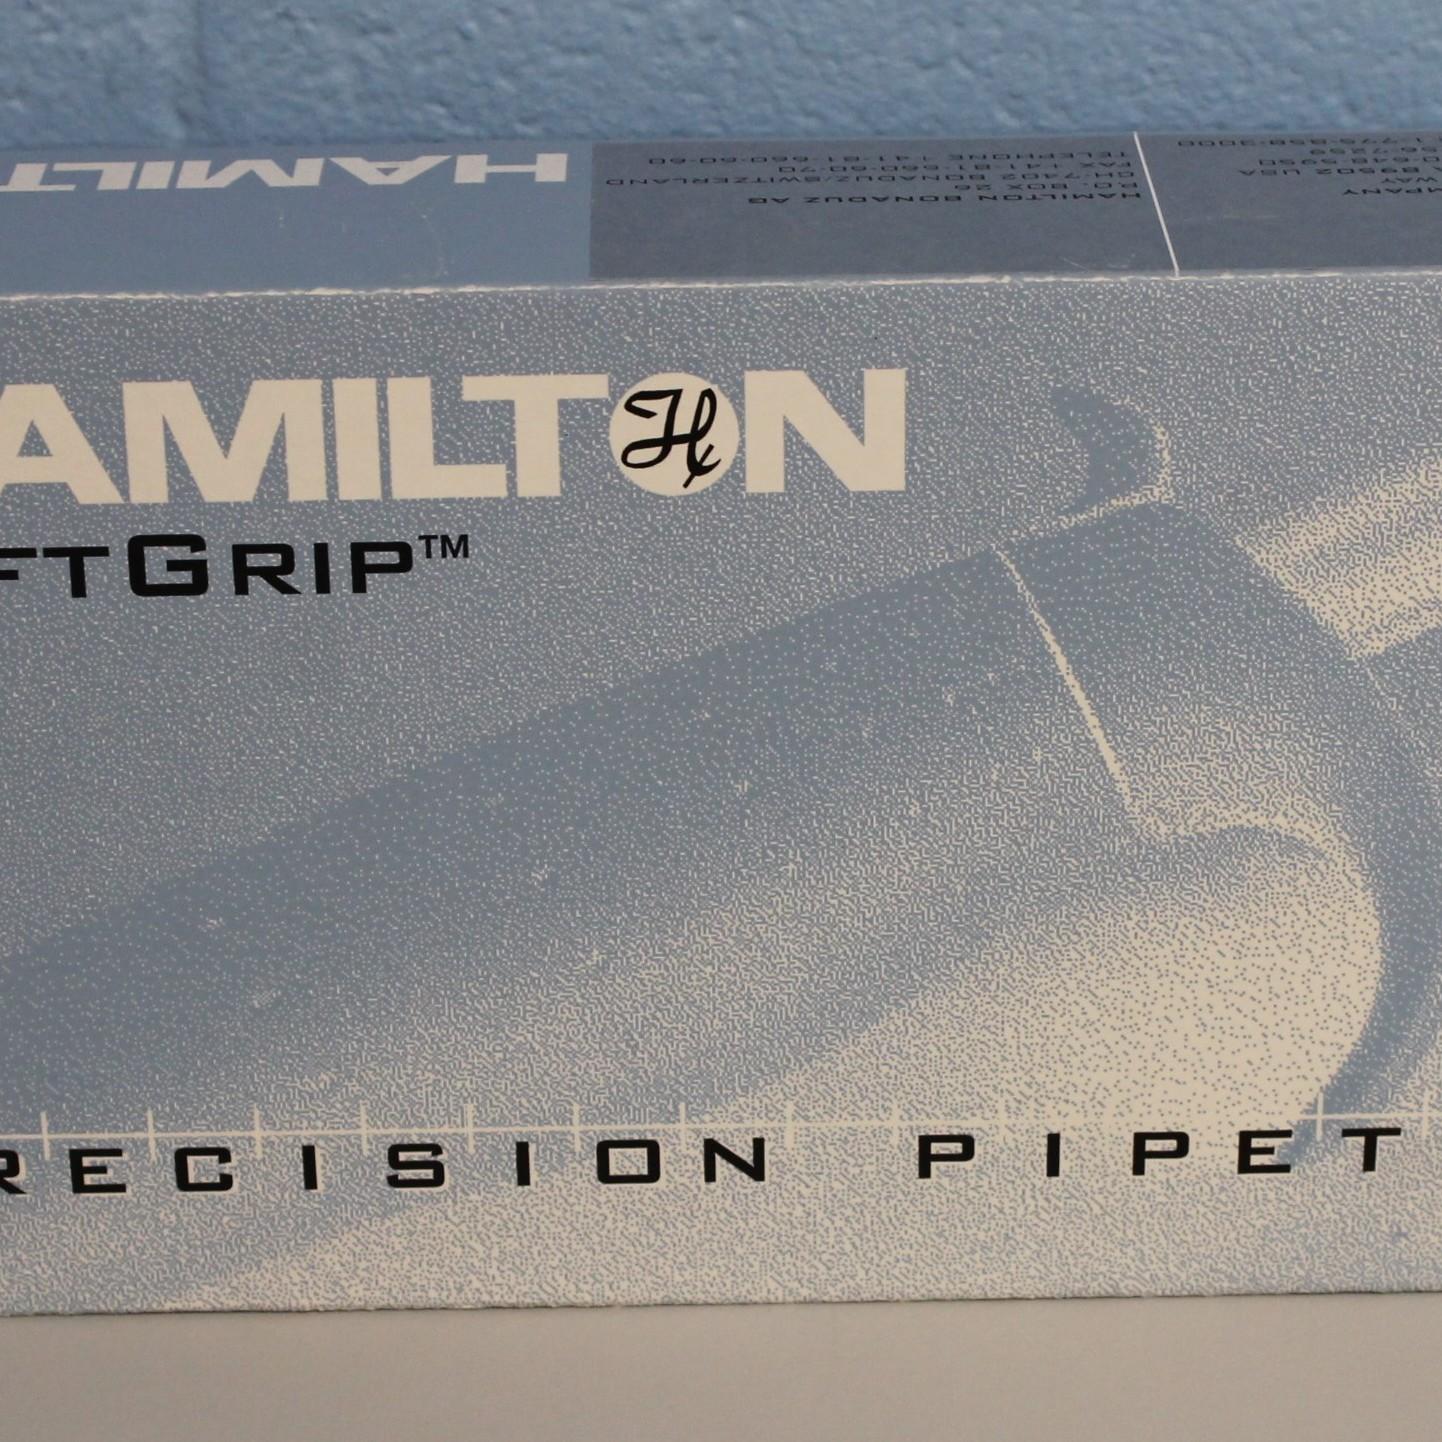 Hamilton 8-Channel Adjustable Volume SoftGrip Pipette Image